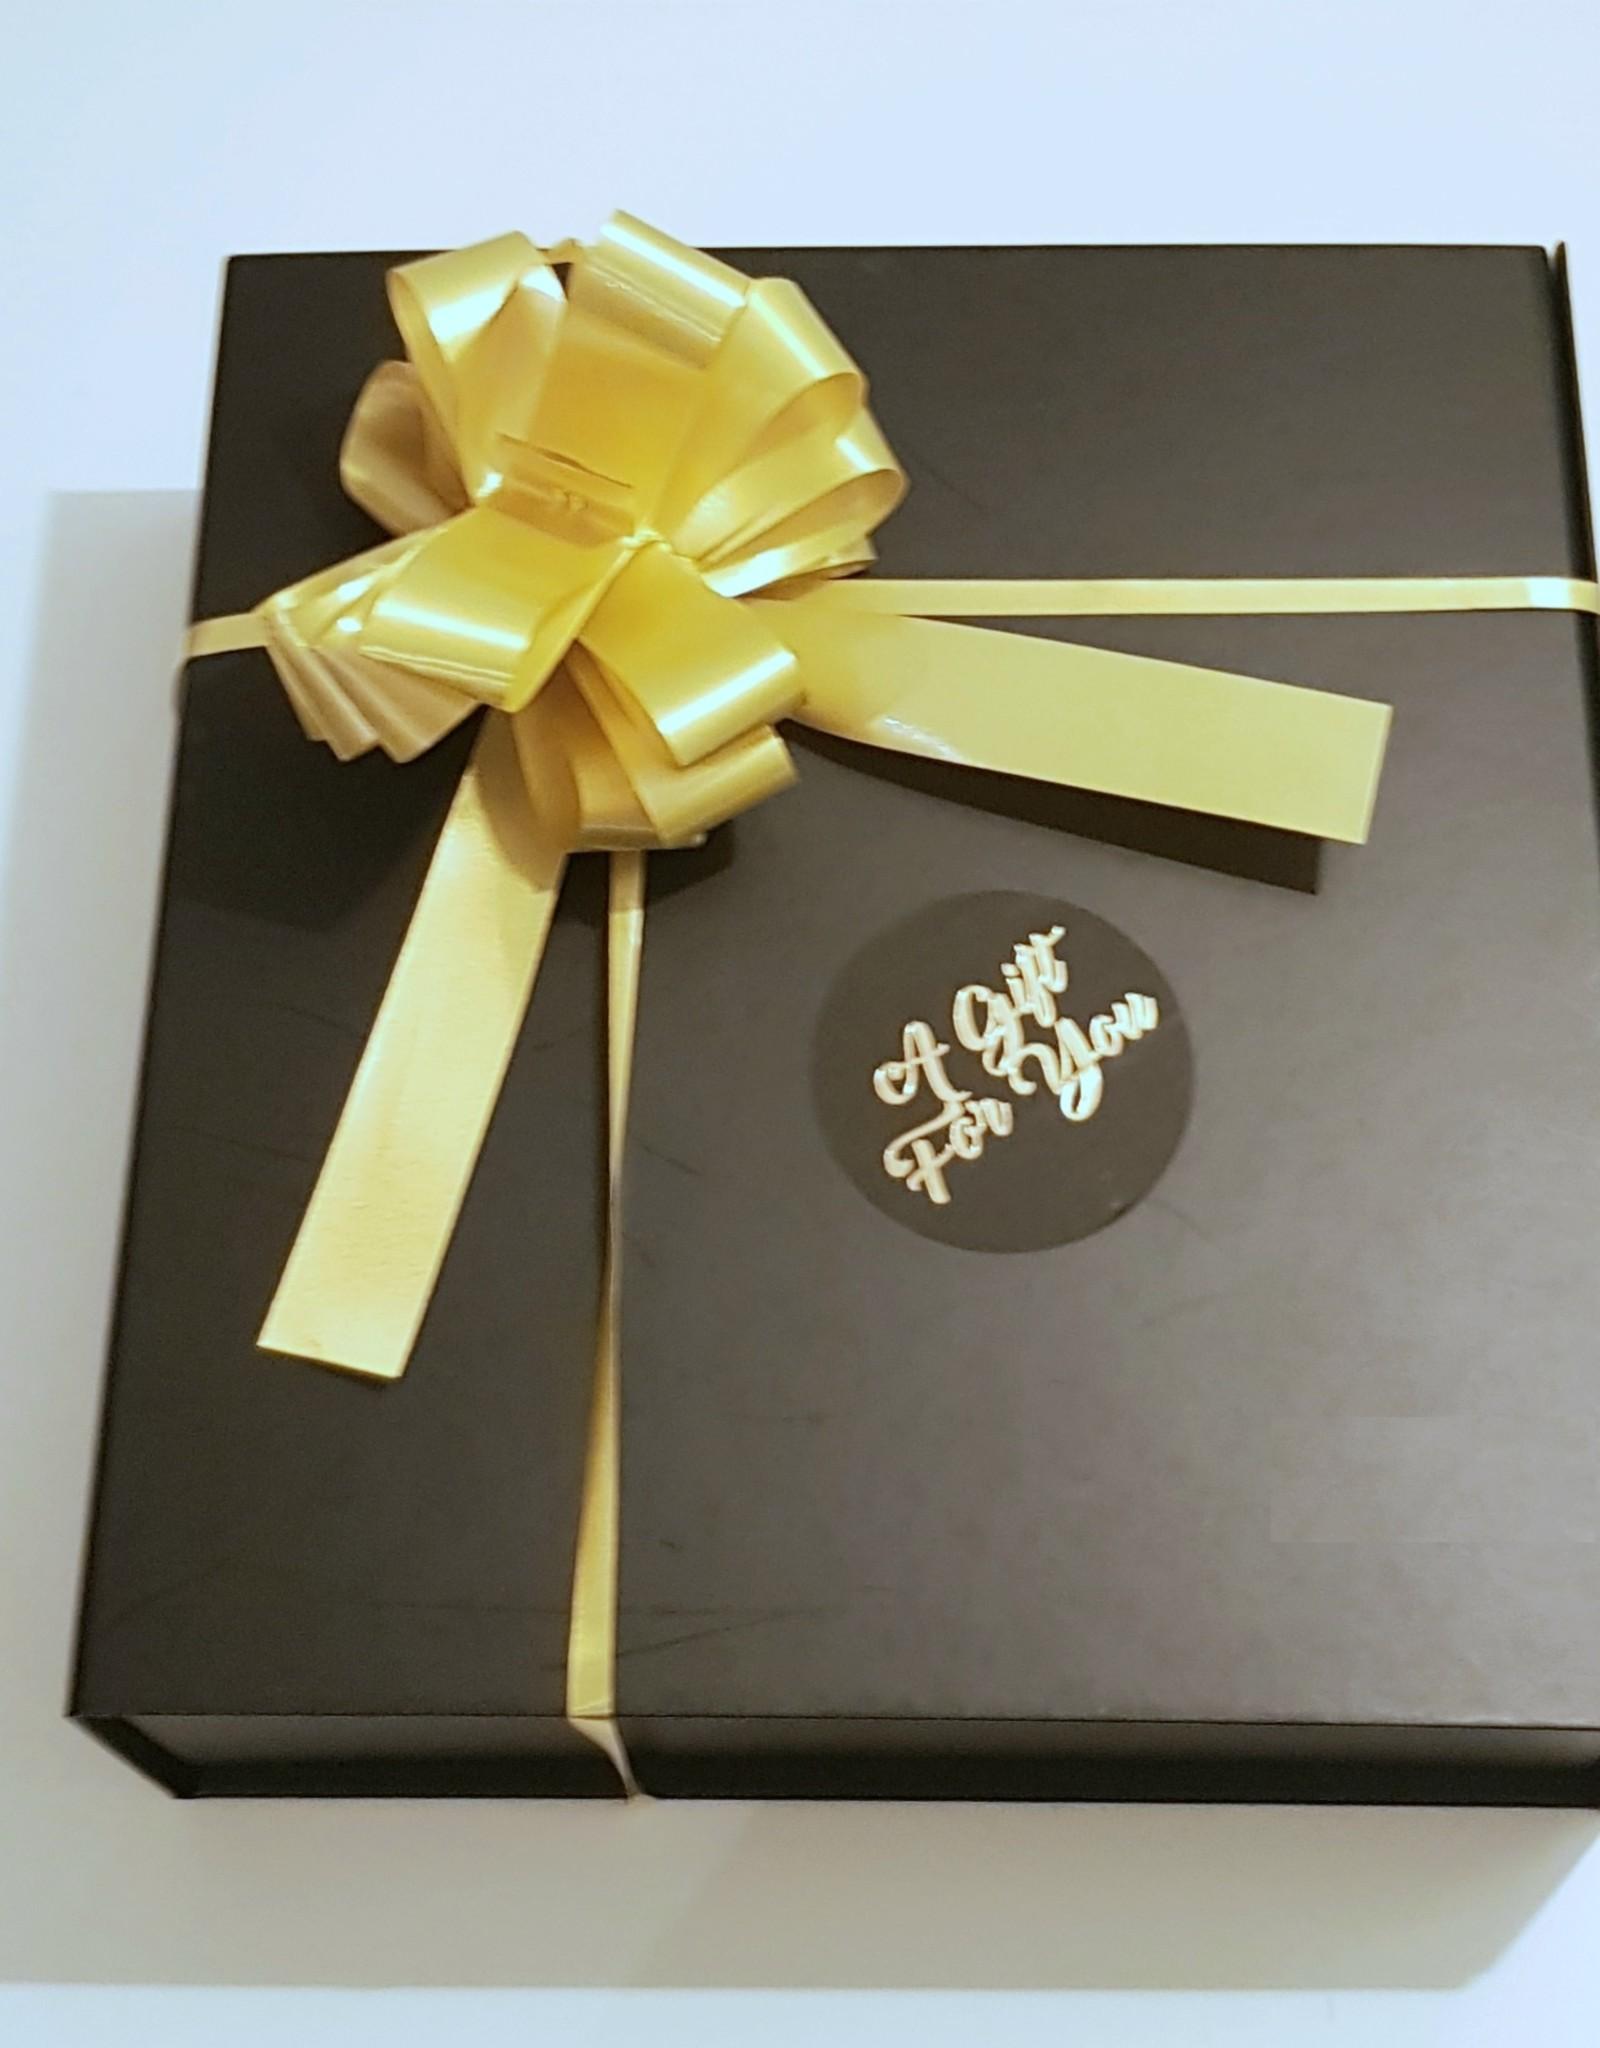 Sjolie geschenkenset / giftset Sjolie sugar scrub  en exfoliating handschoen